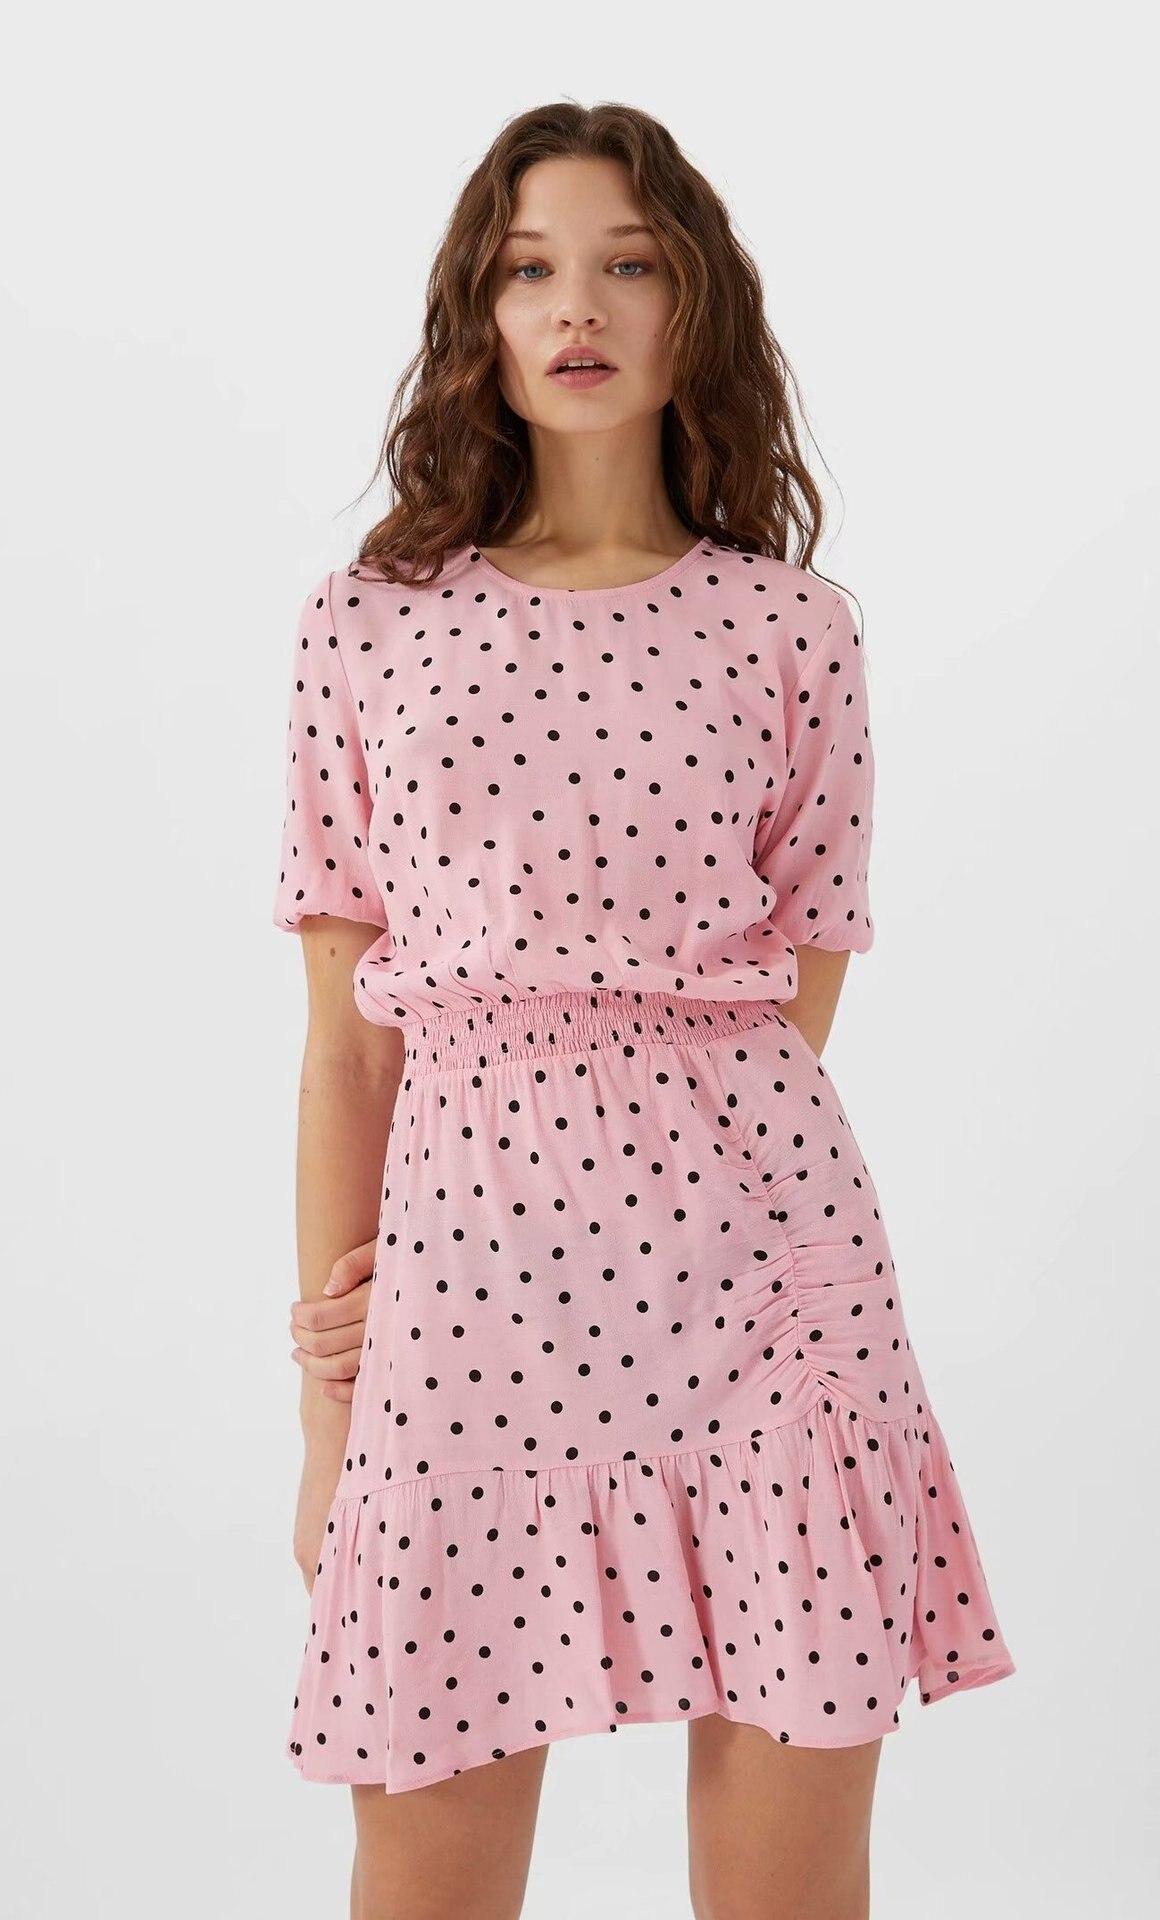 2020 Spring Summer New Flounced Hem Polka Dot Pink Short Zaraing Women Dress Vadiming Sheining Female Sexy Vintage Dress XDN9544